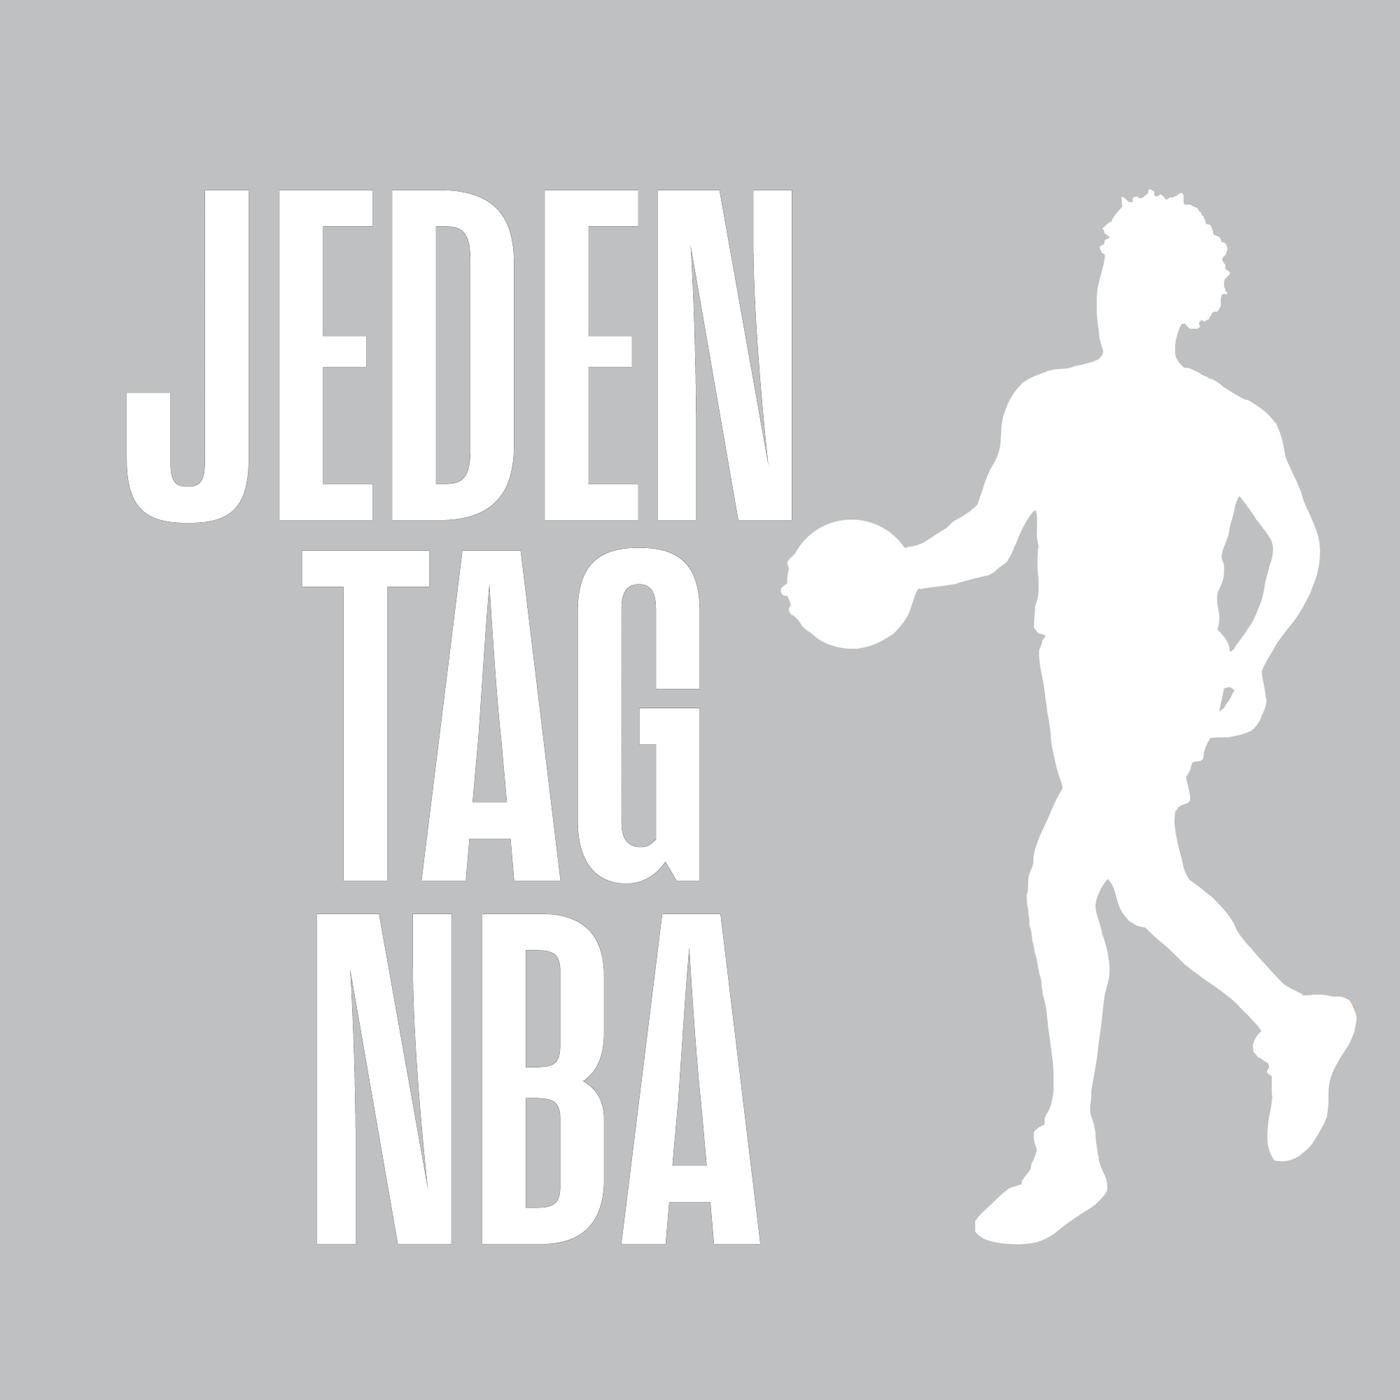 Unsere besten NBA-Wetten 2021-22: MVP, DPOY, ROY & Top-5 Over-Unders - Mit Tobias Bühner